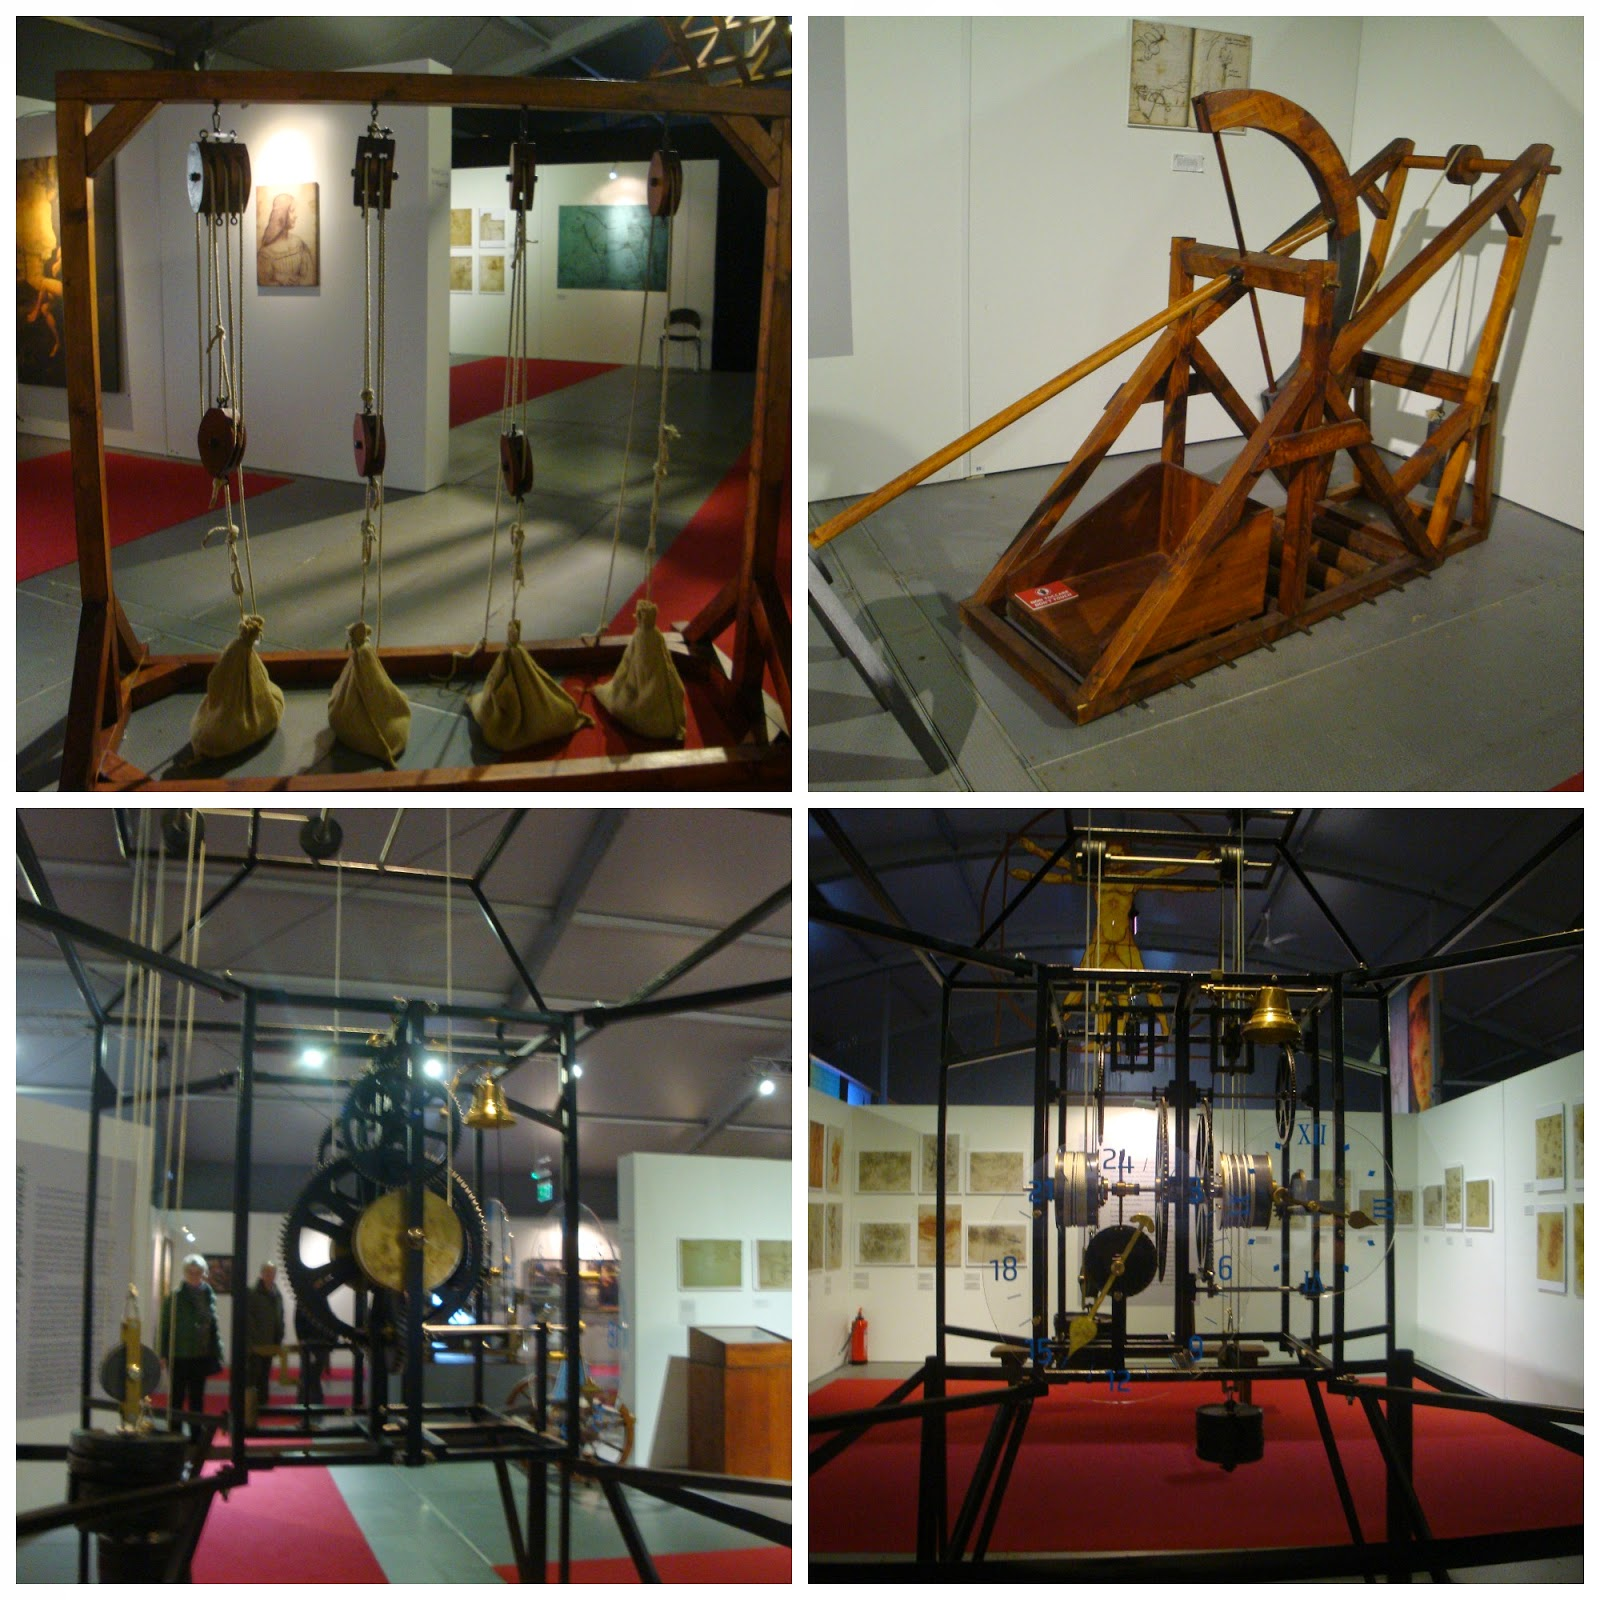 Da Vinci exploring arts & science die Austellung em Berlim